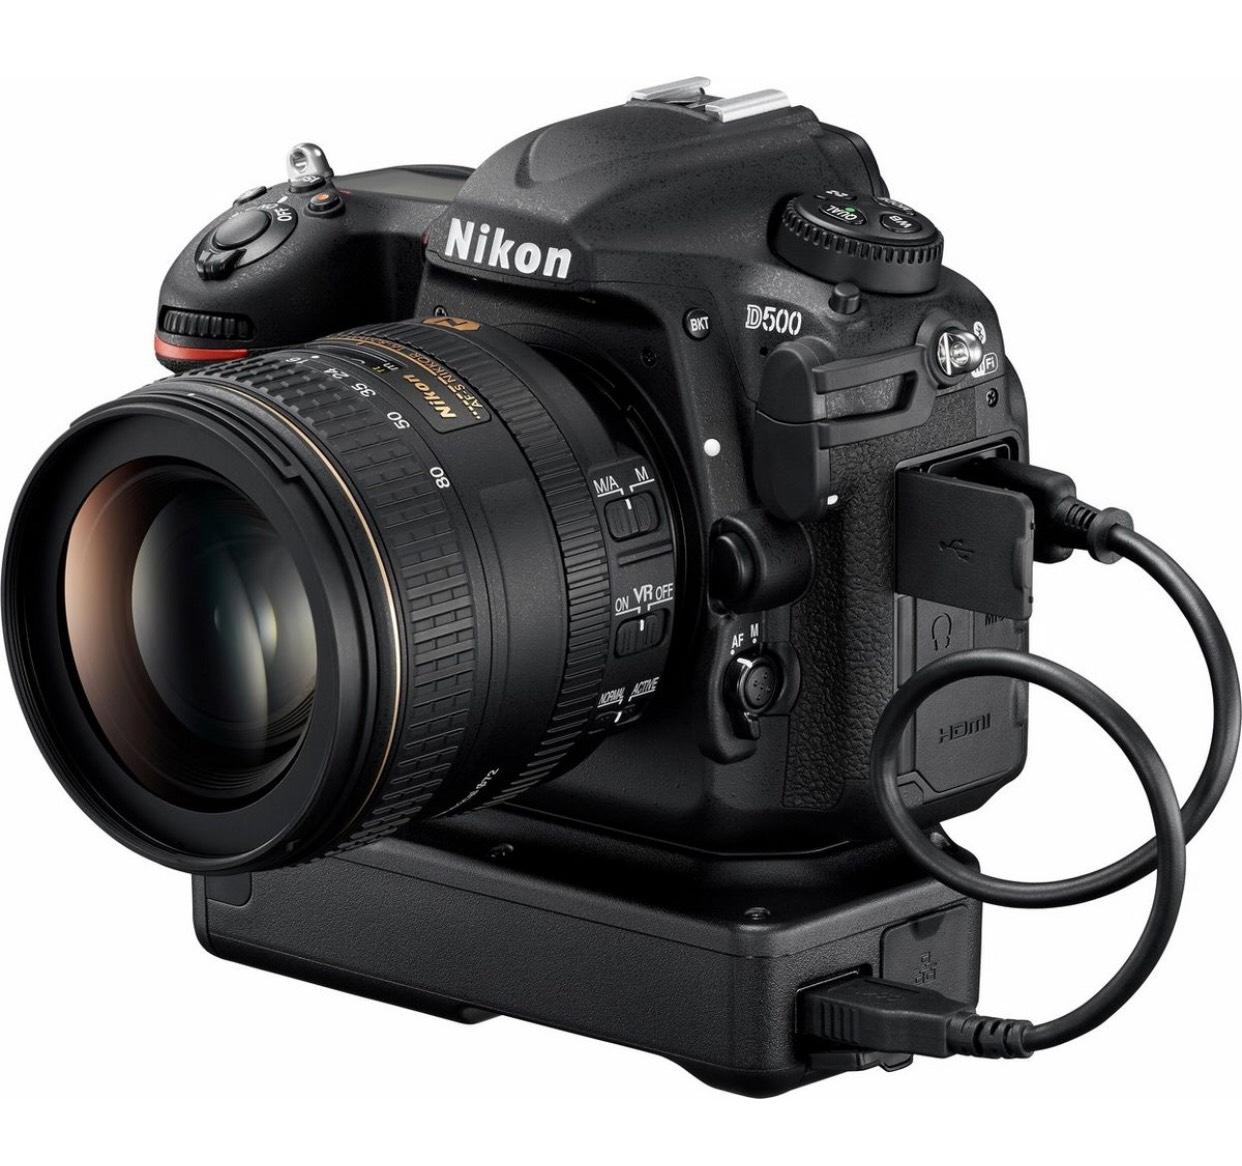 Nikon WT-7 bei Otto zum Schnäppchenpreis